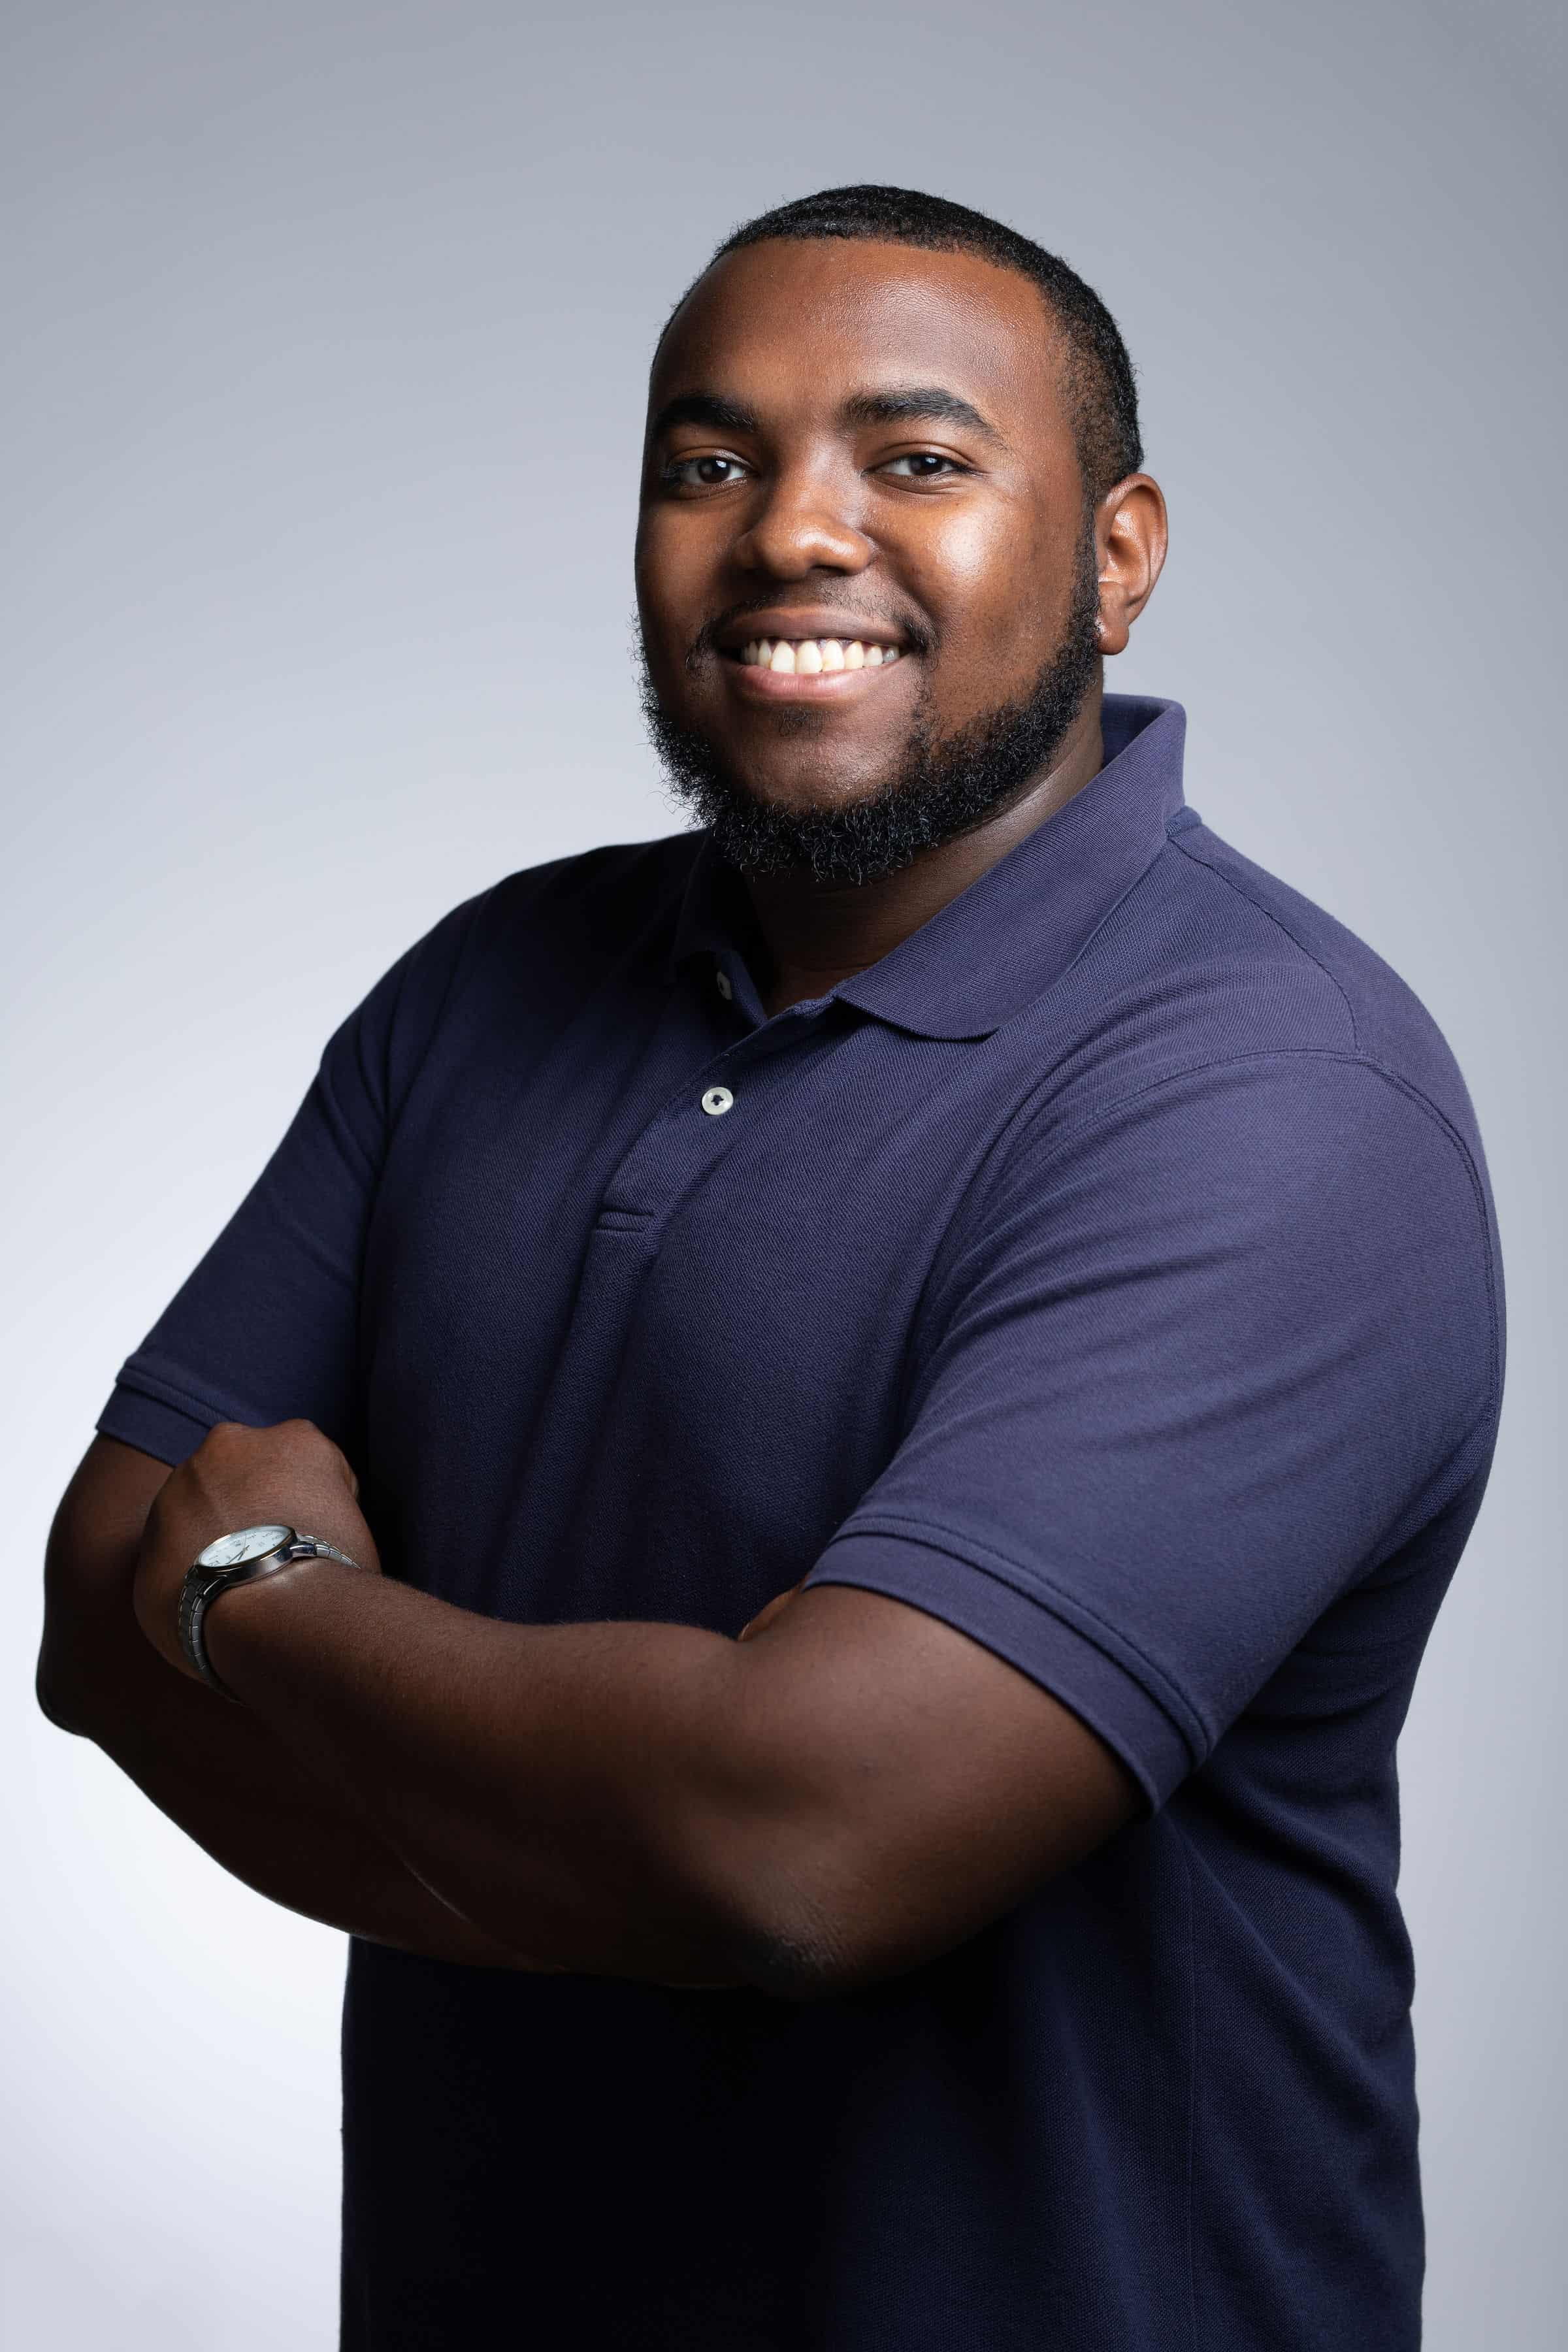 Demetrius Smith